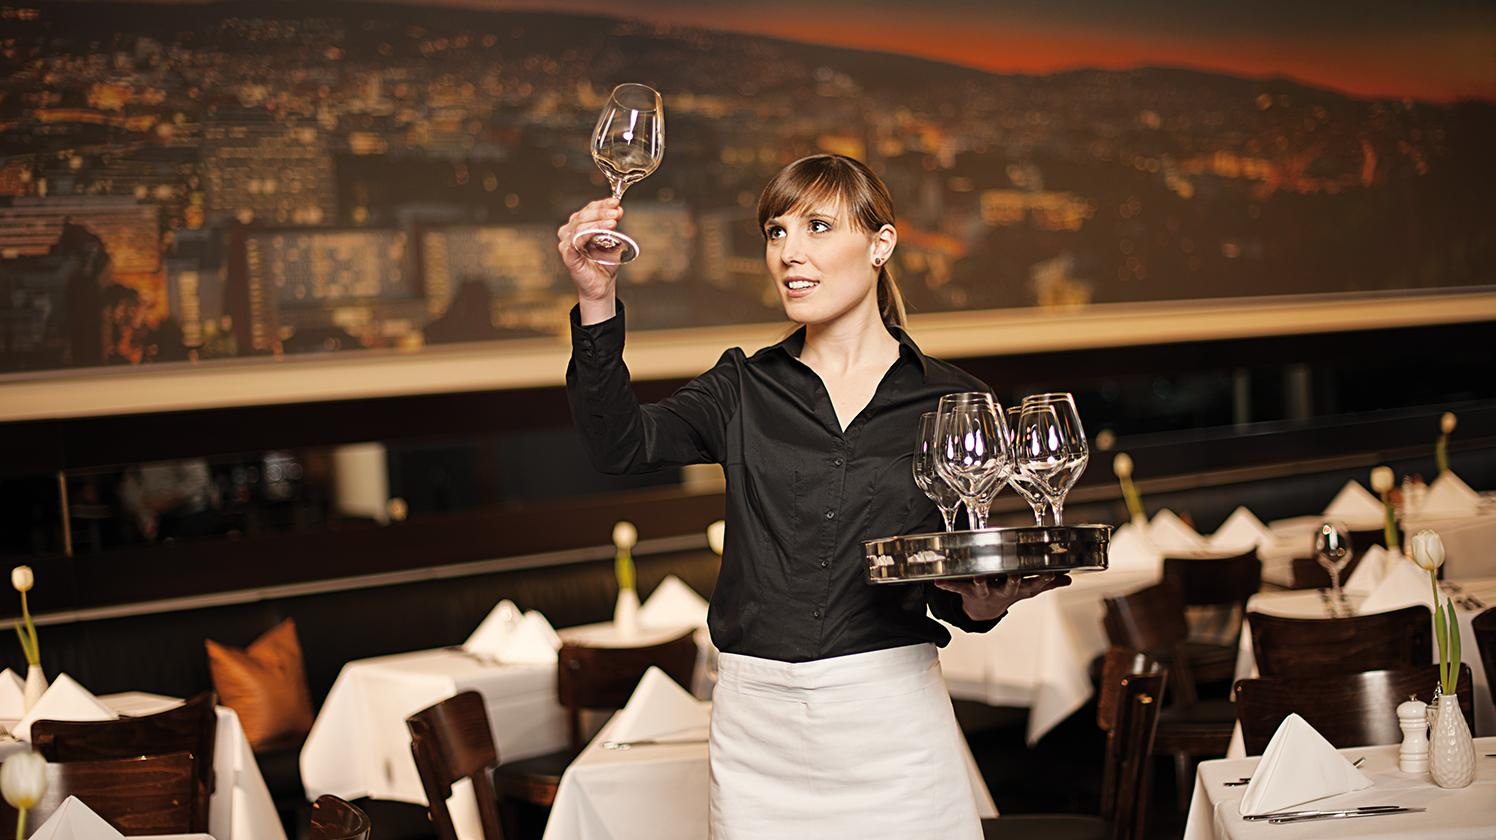 restaurant waterdispenser serveerster met glas